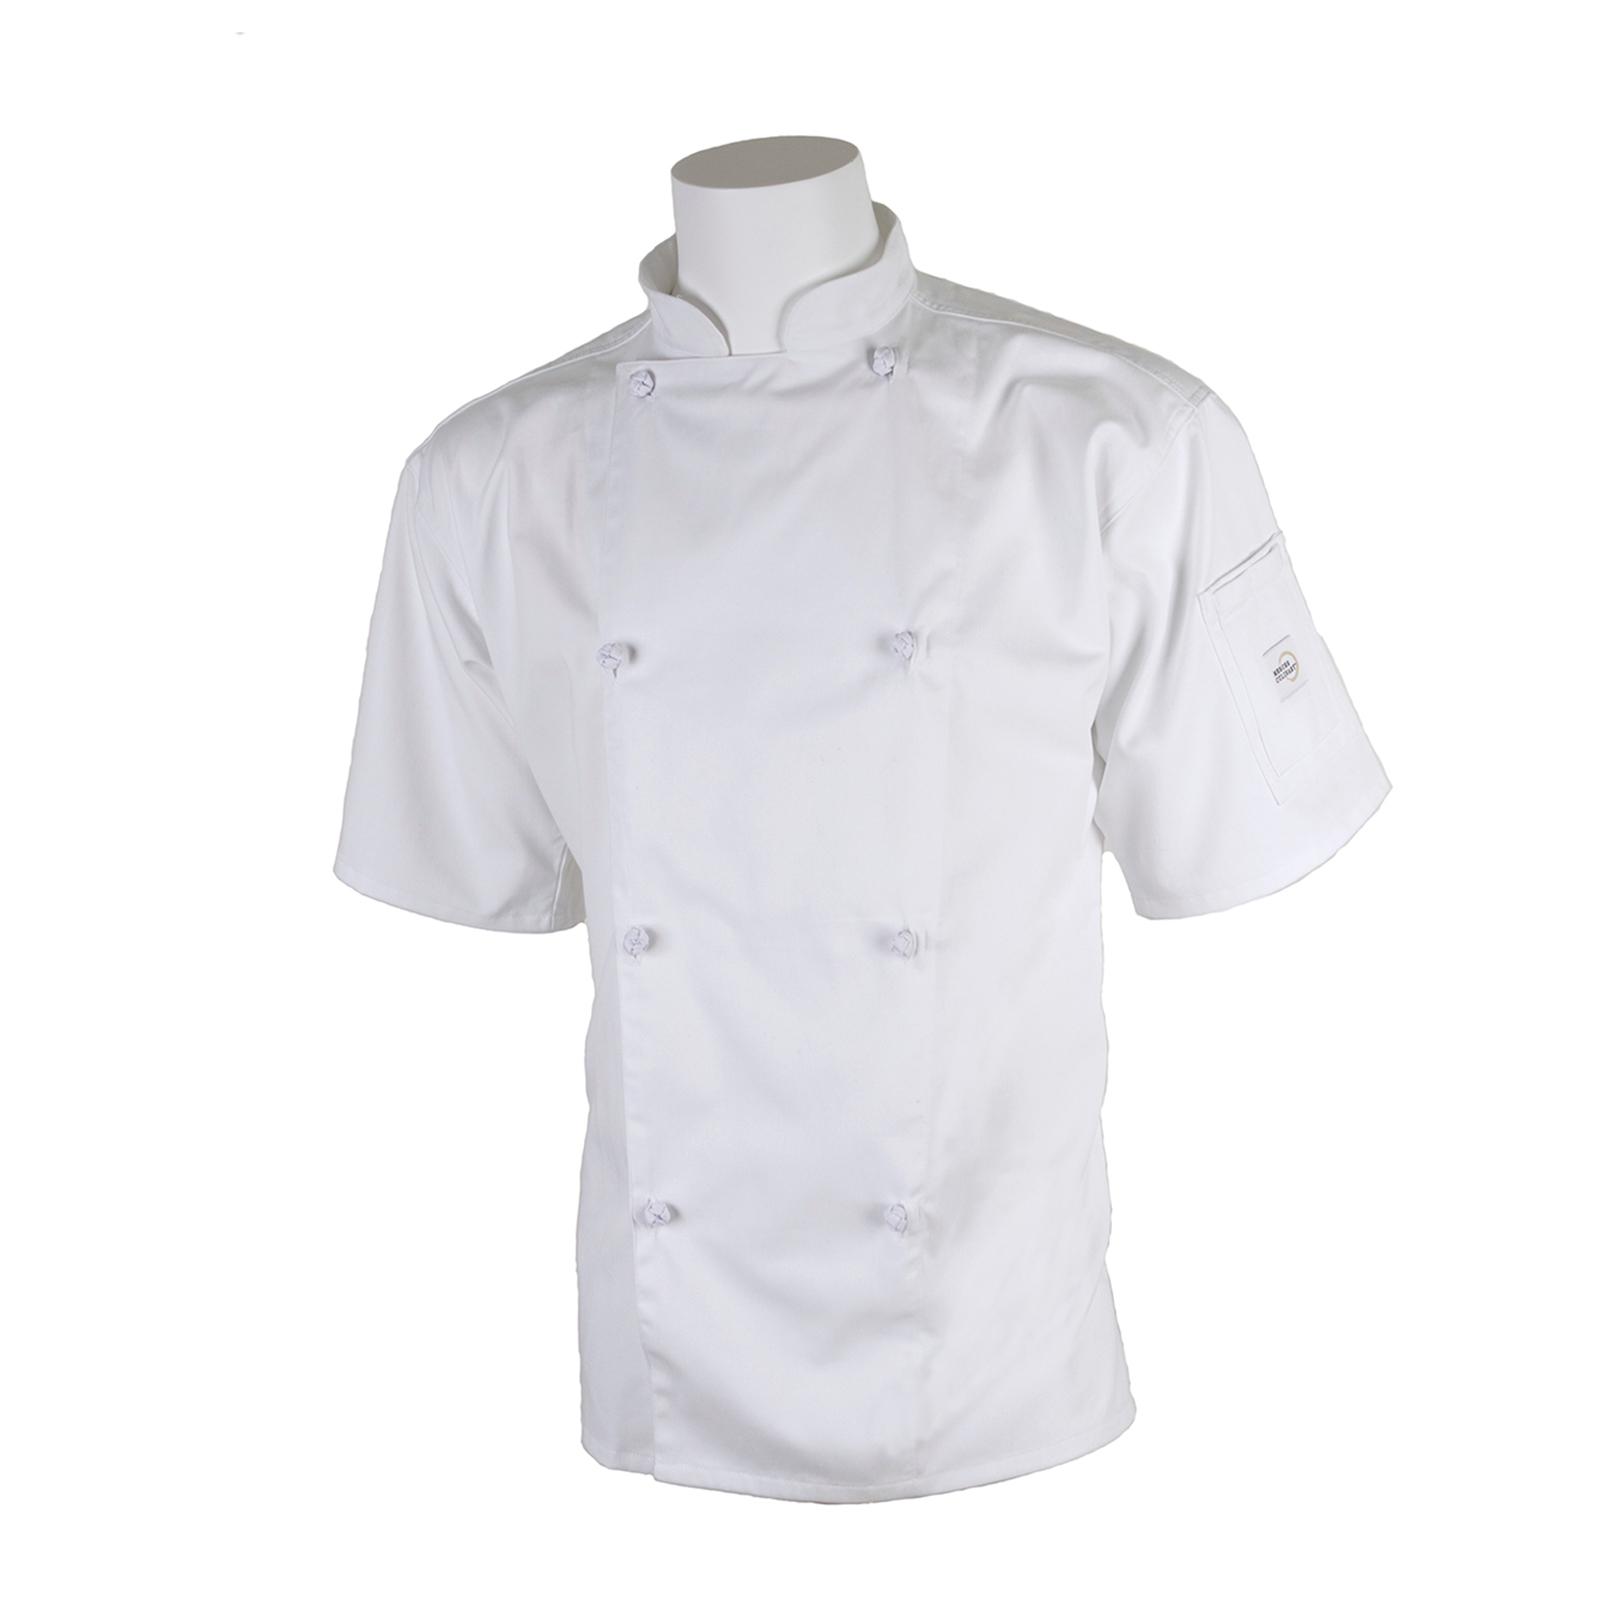 Mercer Culinary M61022WHM chef's coat